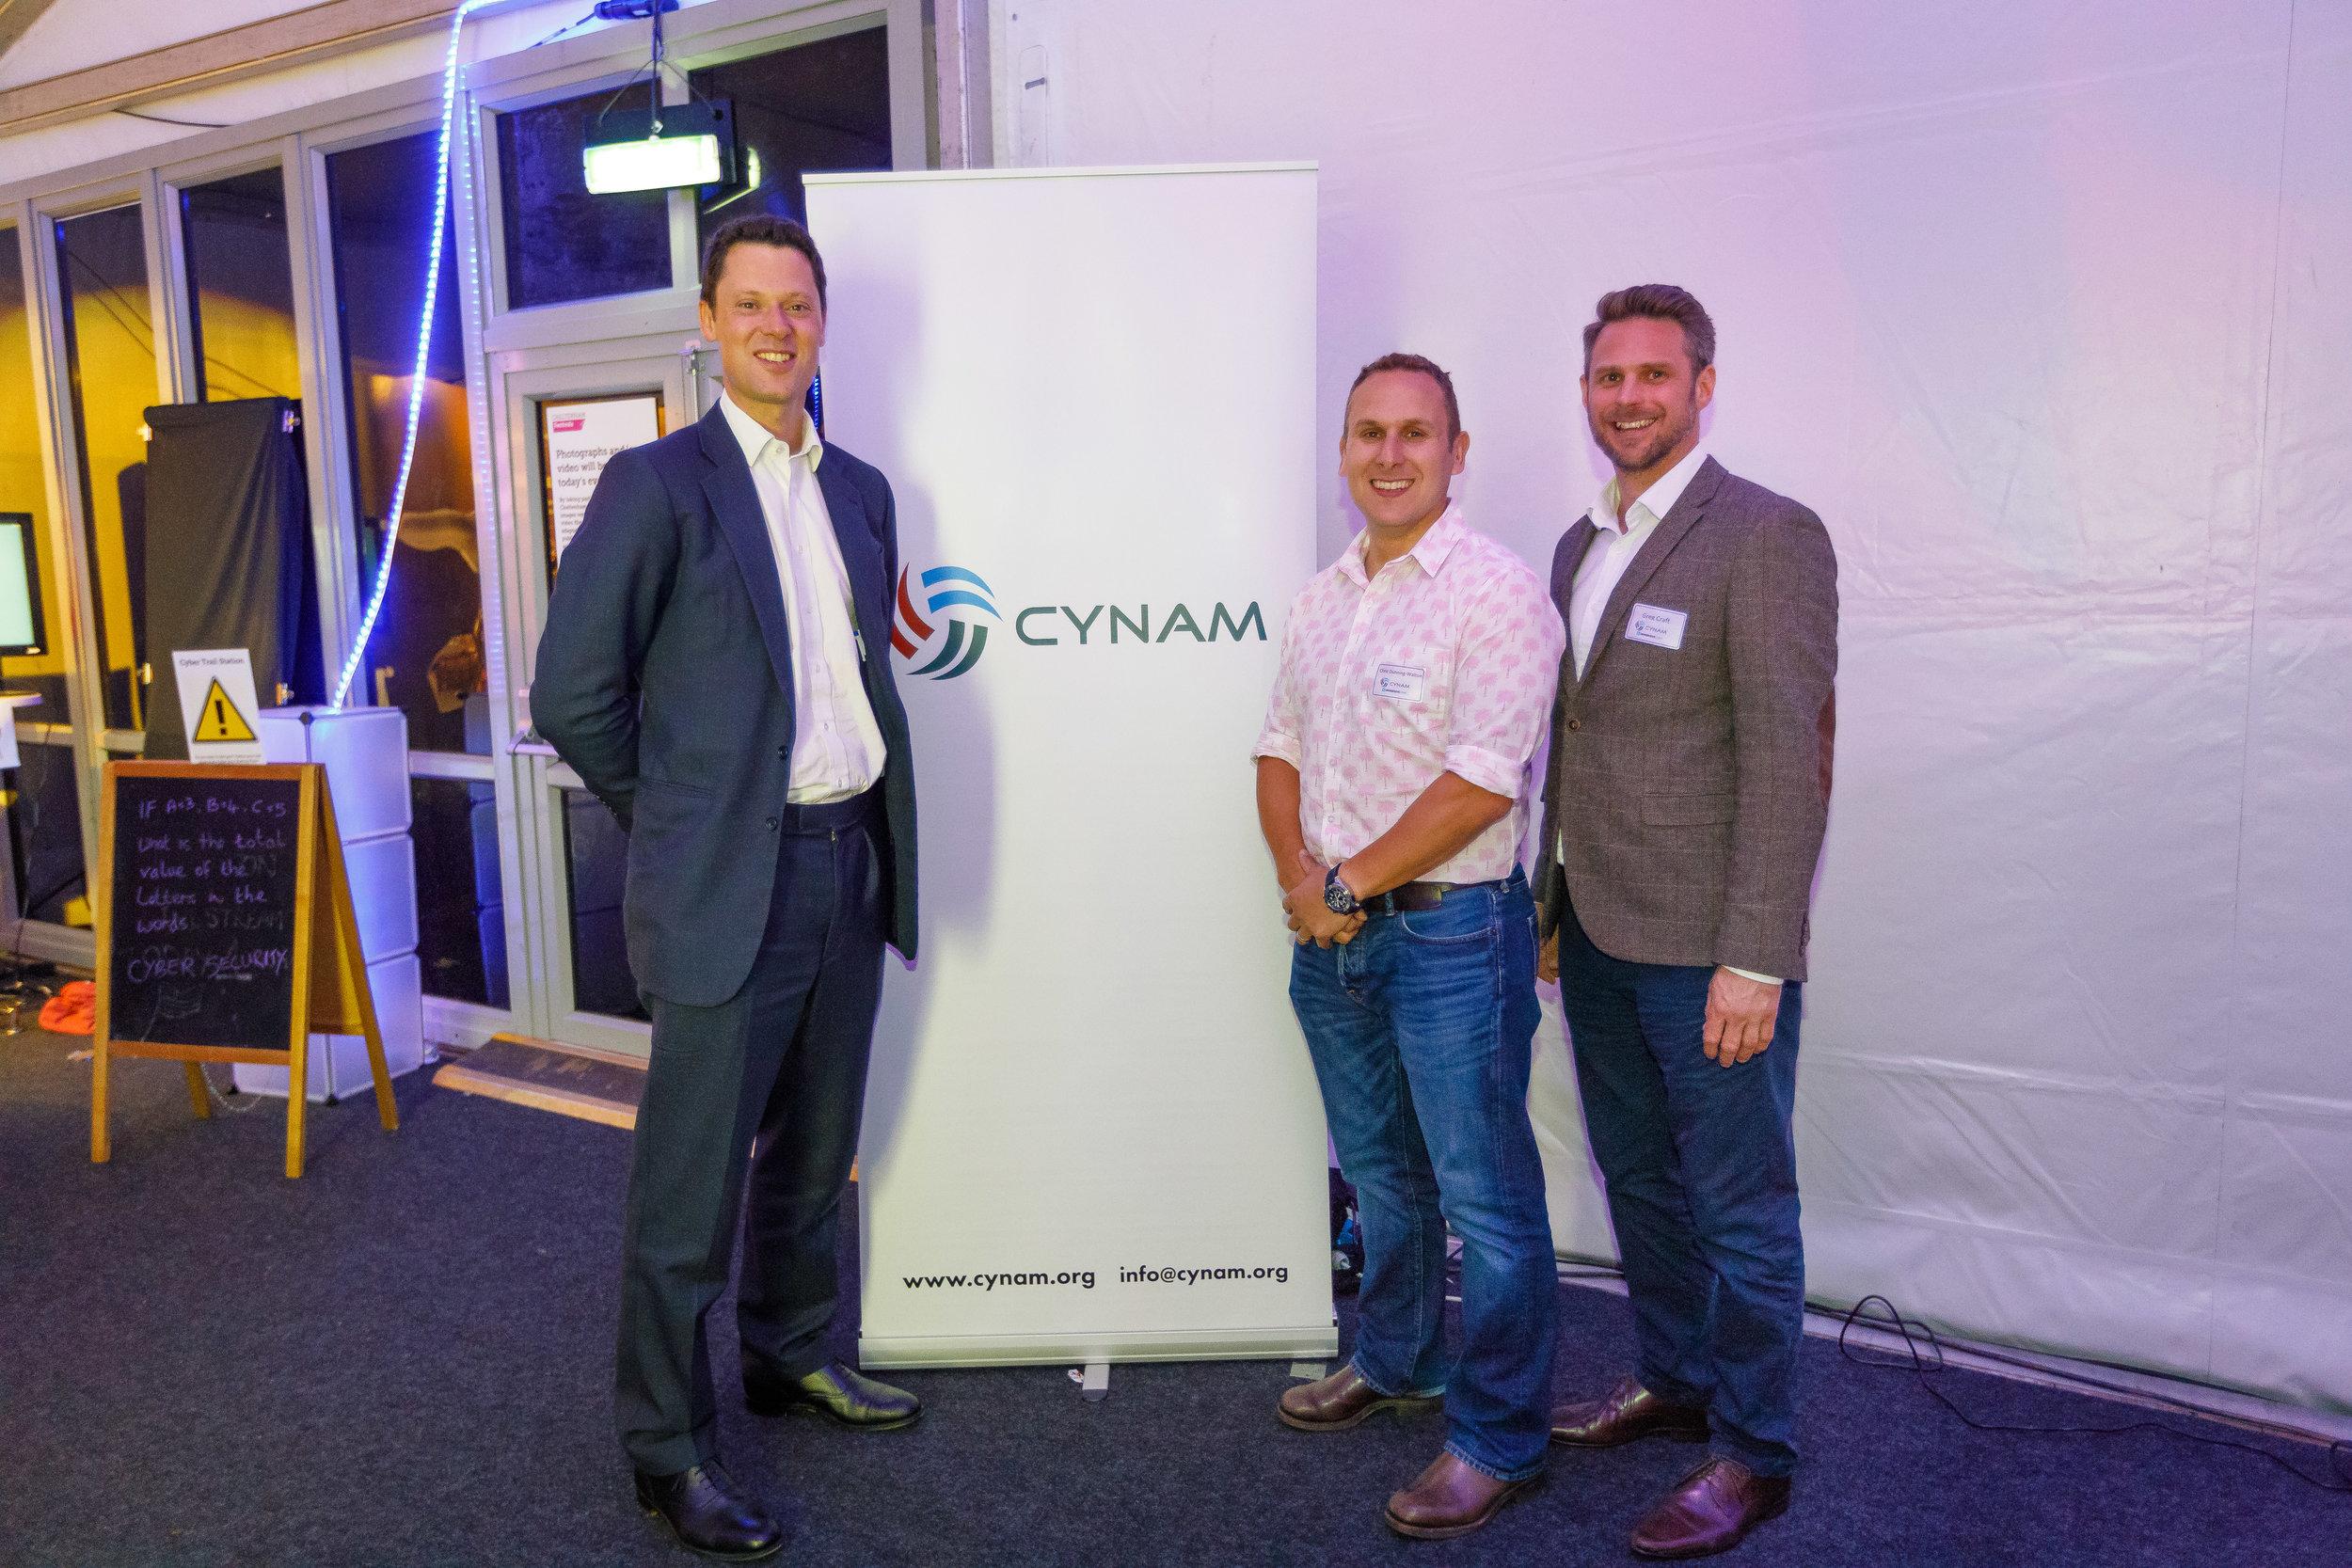 2018.06.08-CyNam-Cheltenham-Science-Festival-iPlus-0055.jpg